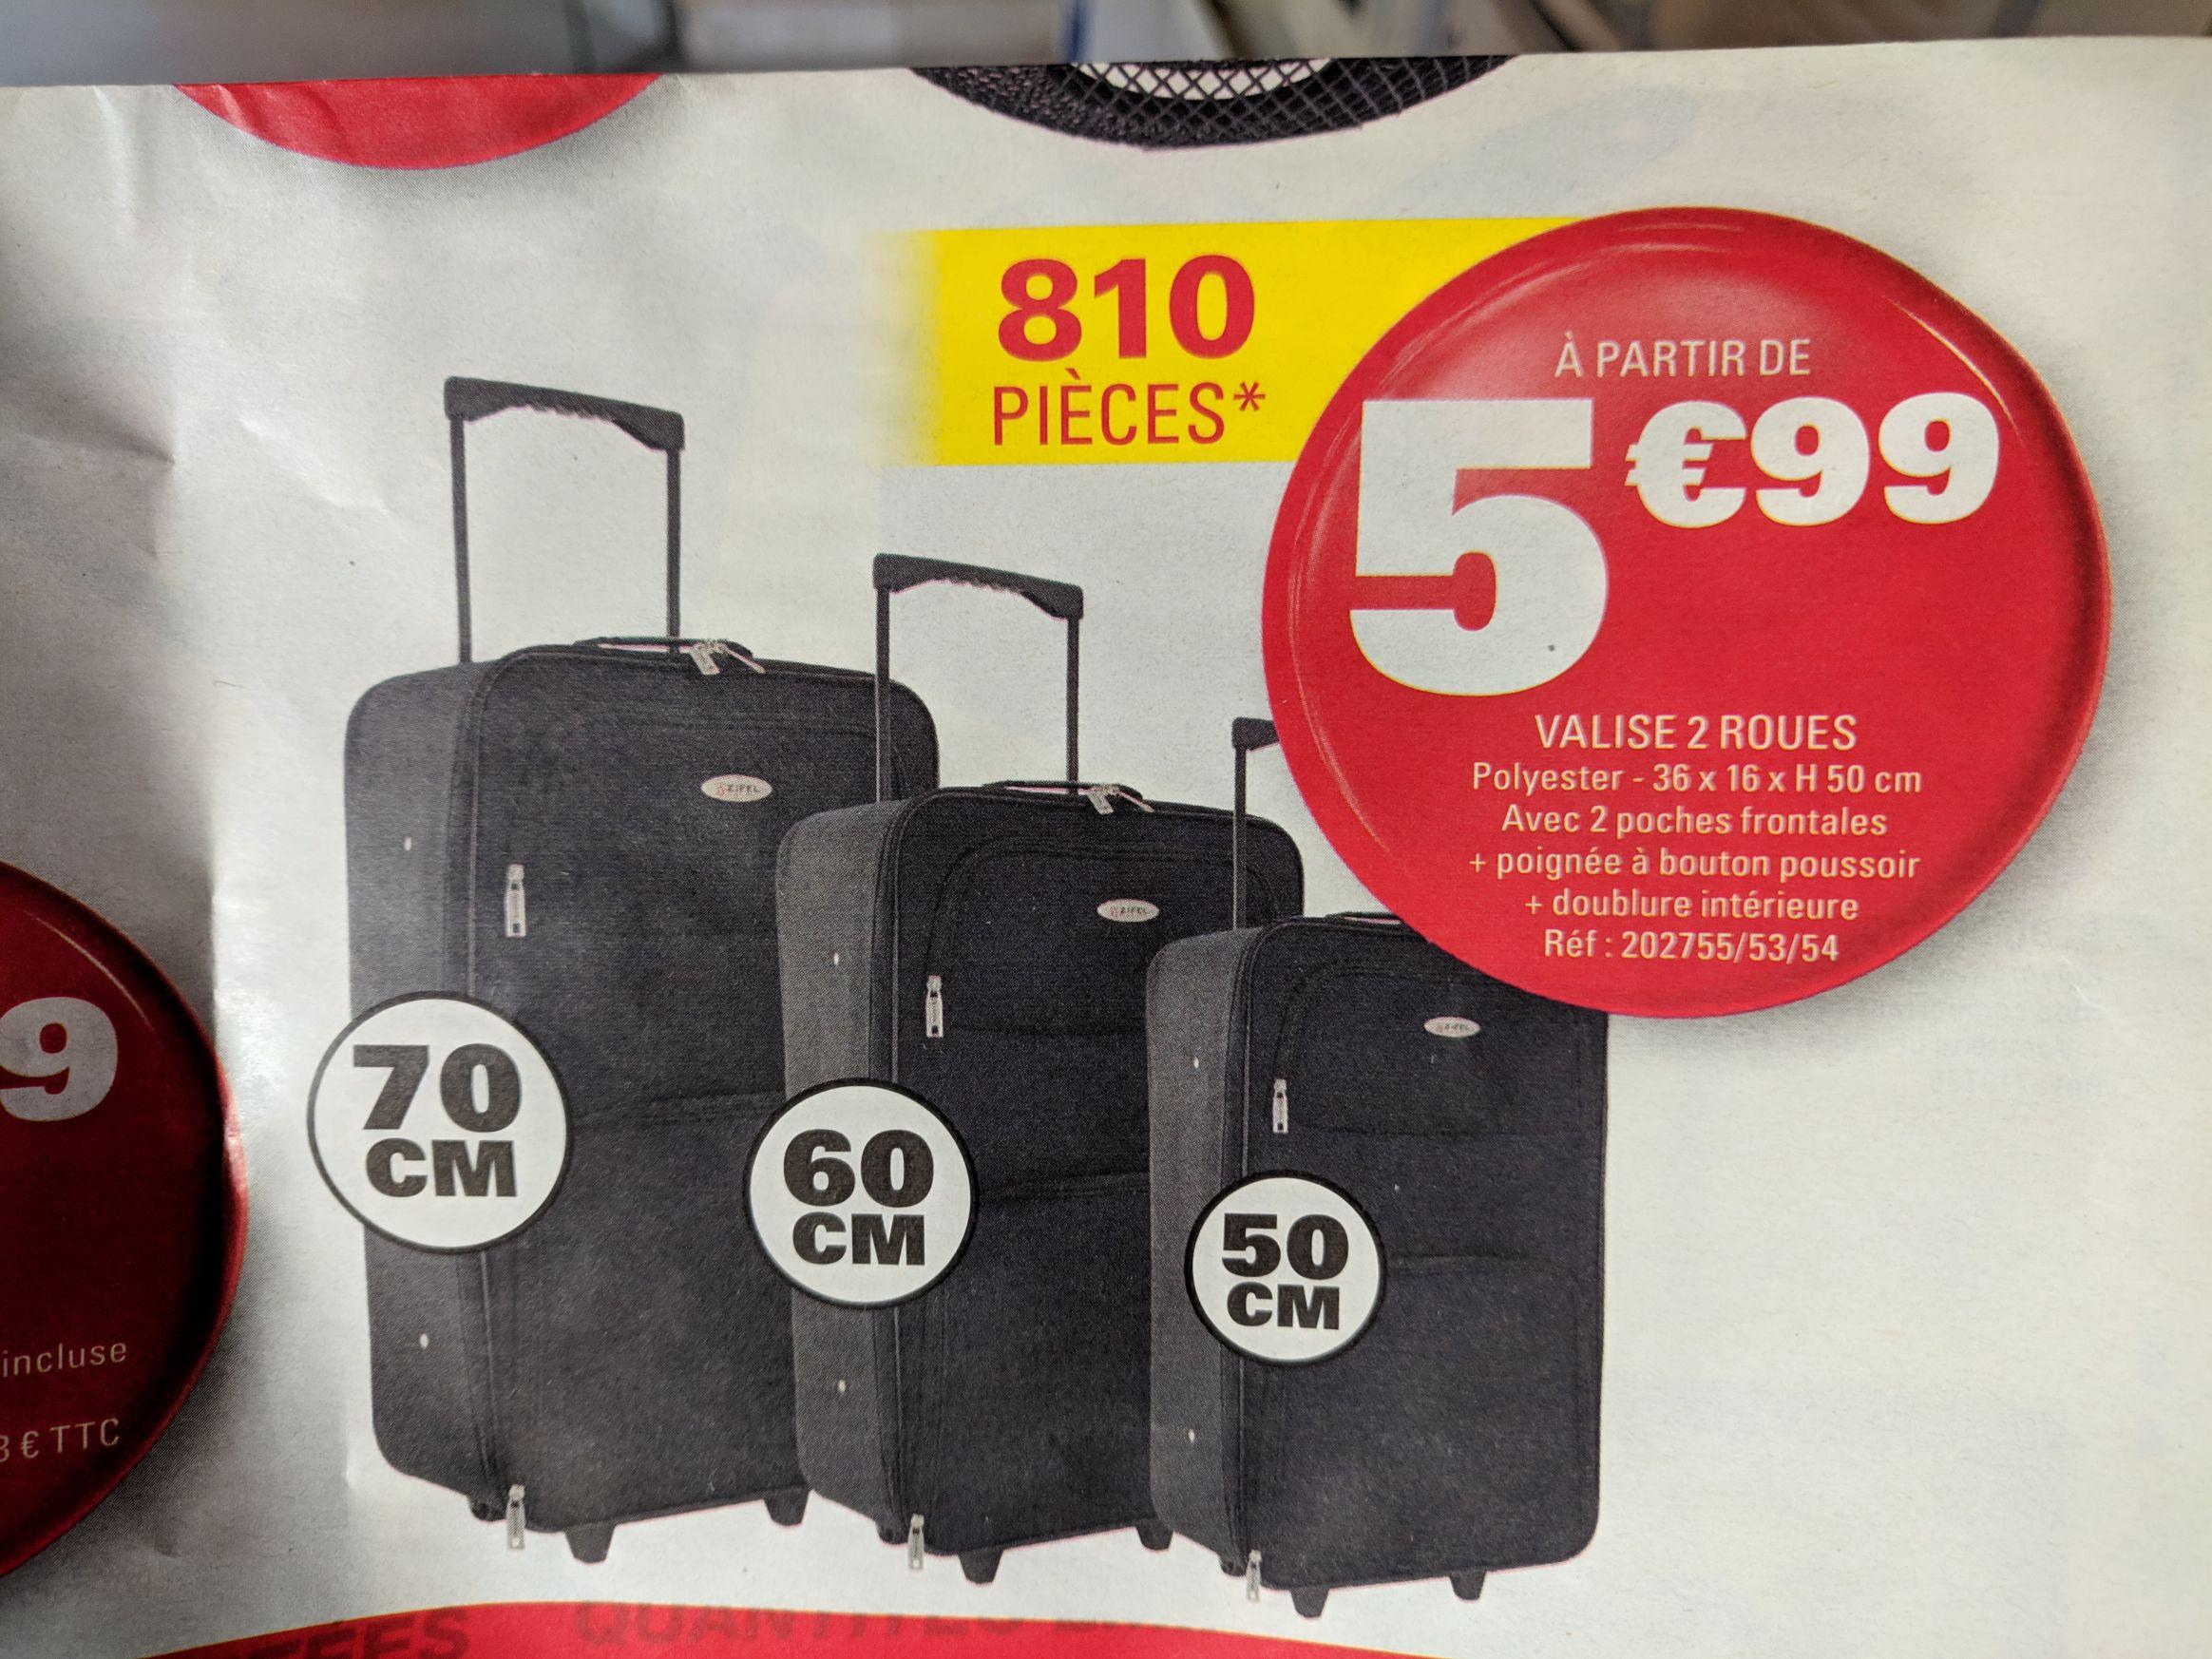 Valise cabine - 50 cm, 2 Roues